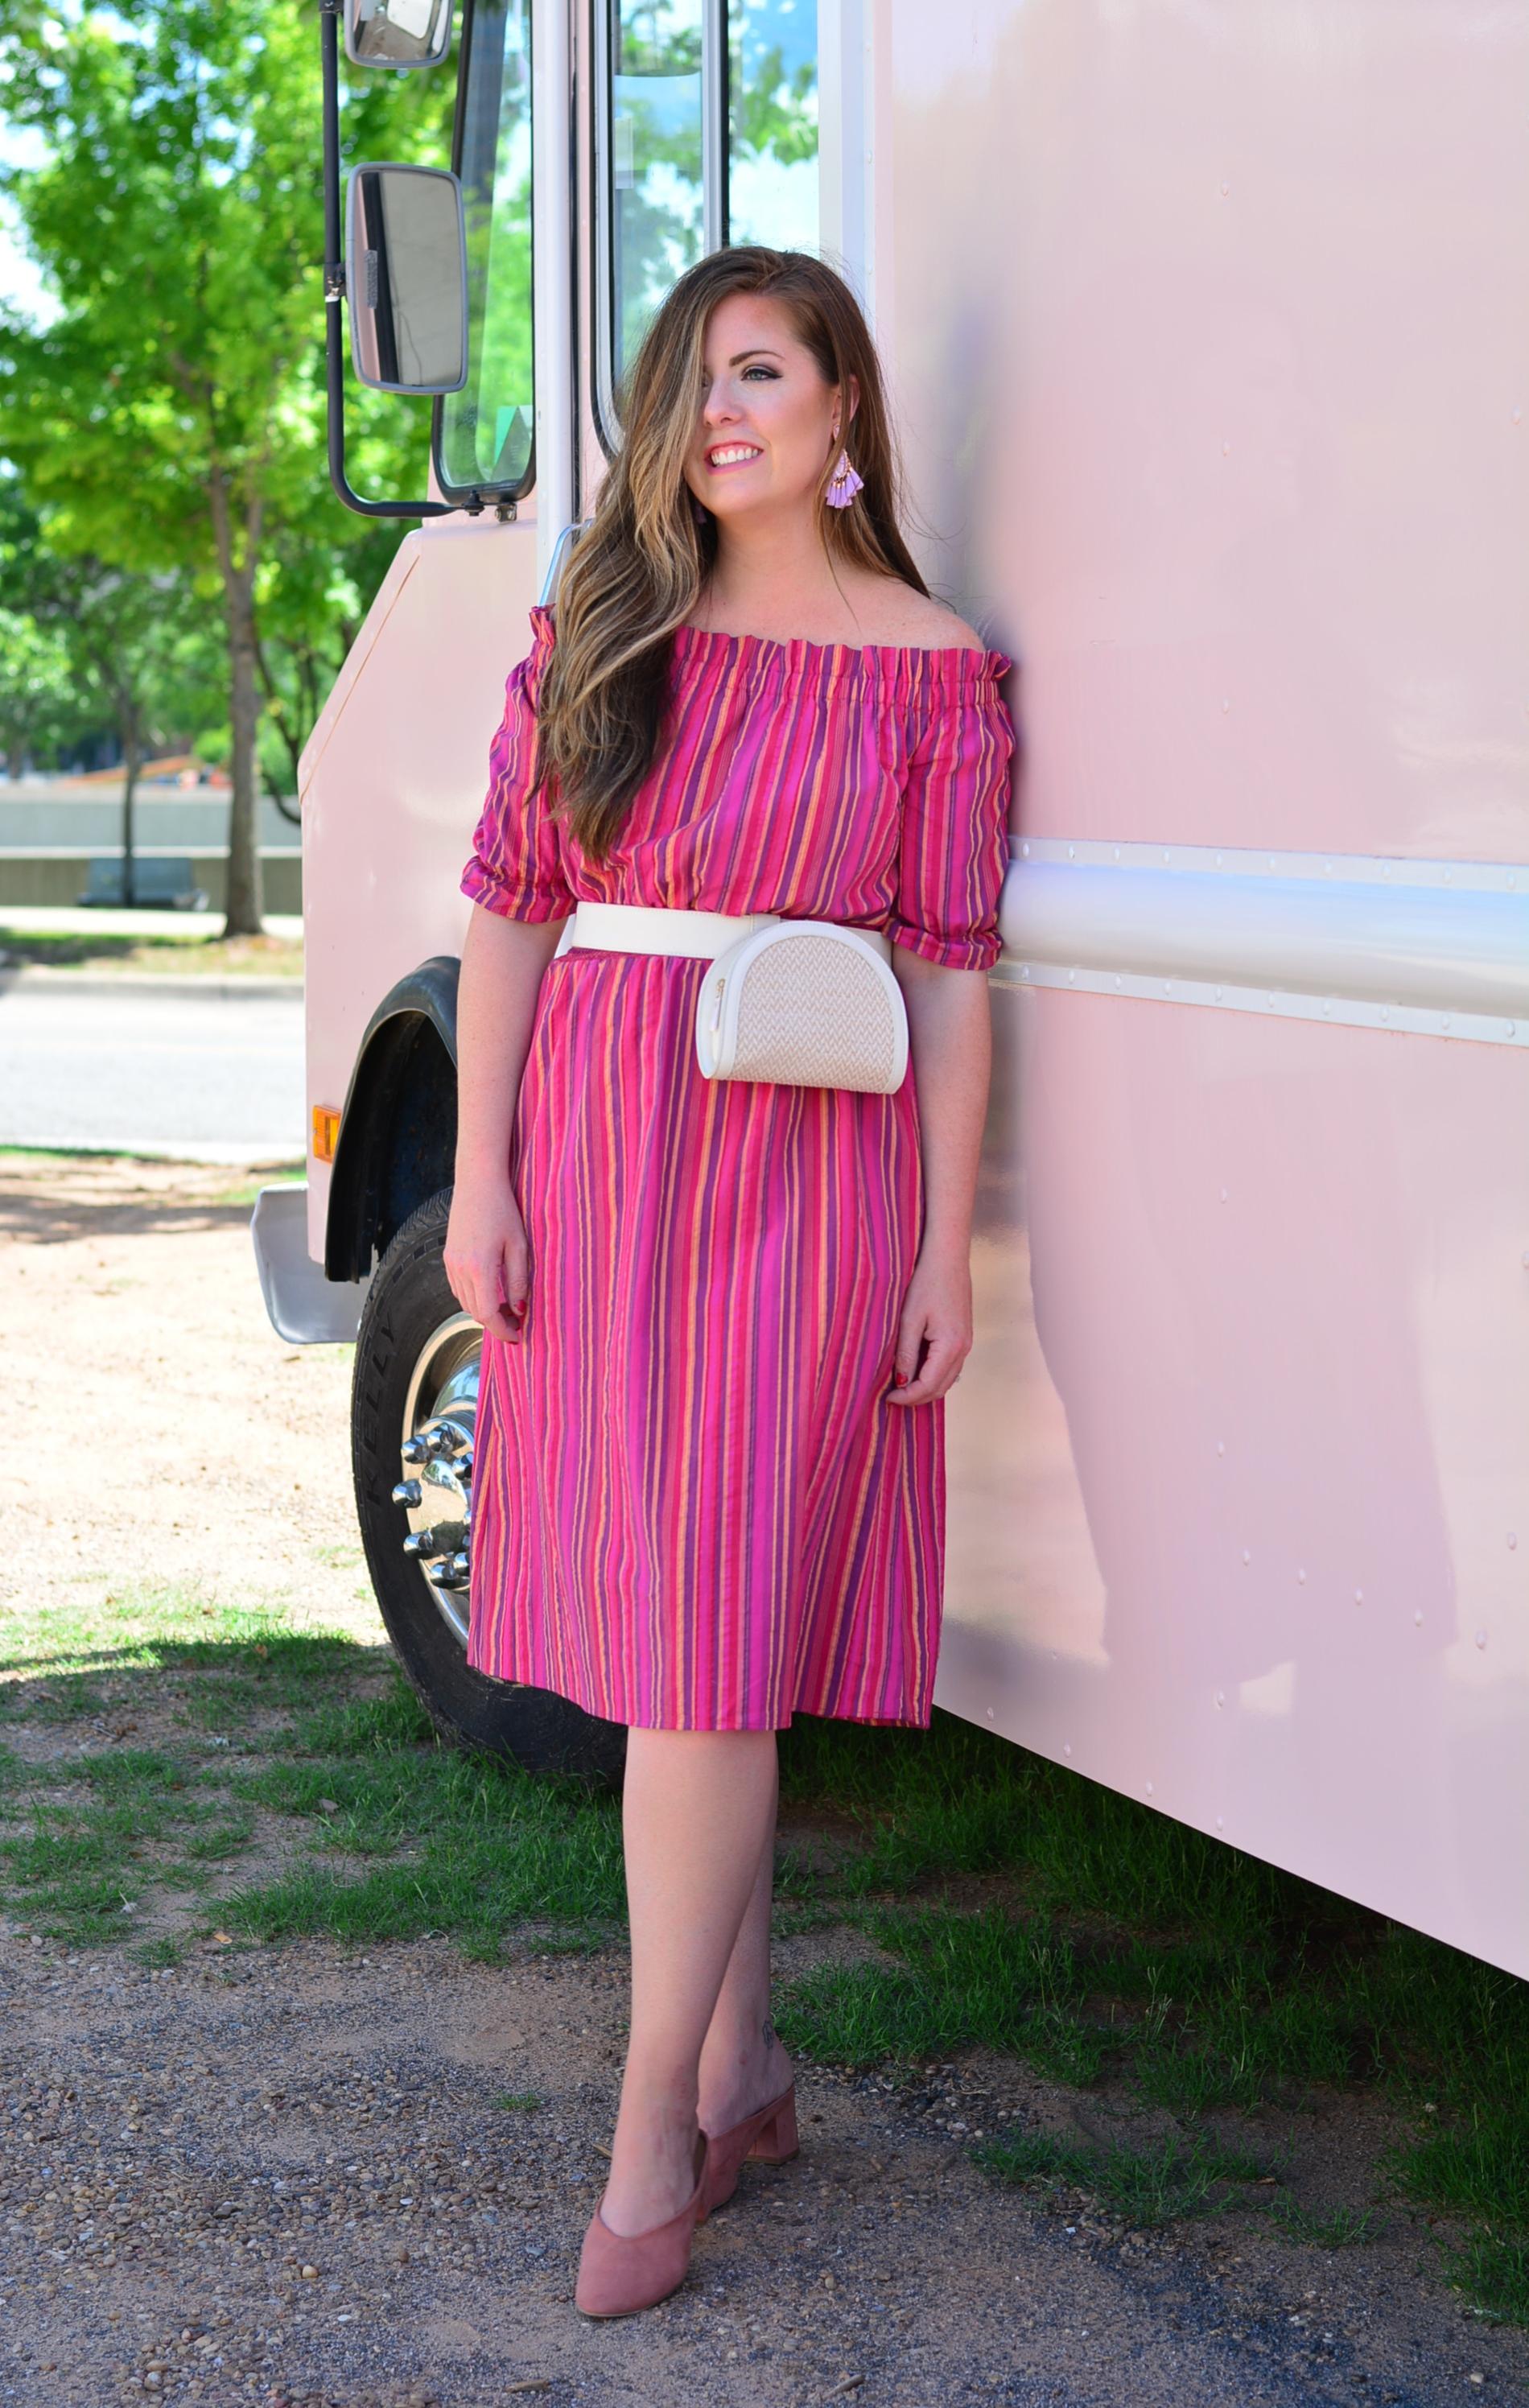 Summer Outfit idea off the shoulder dress with a belt bag